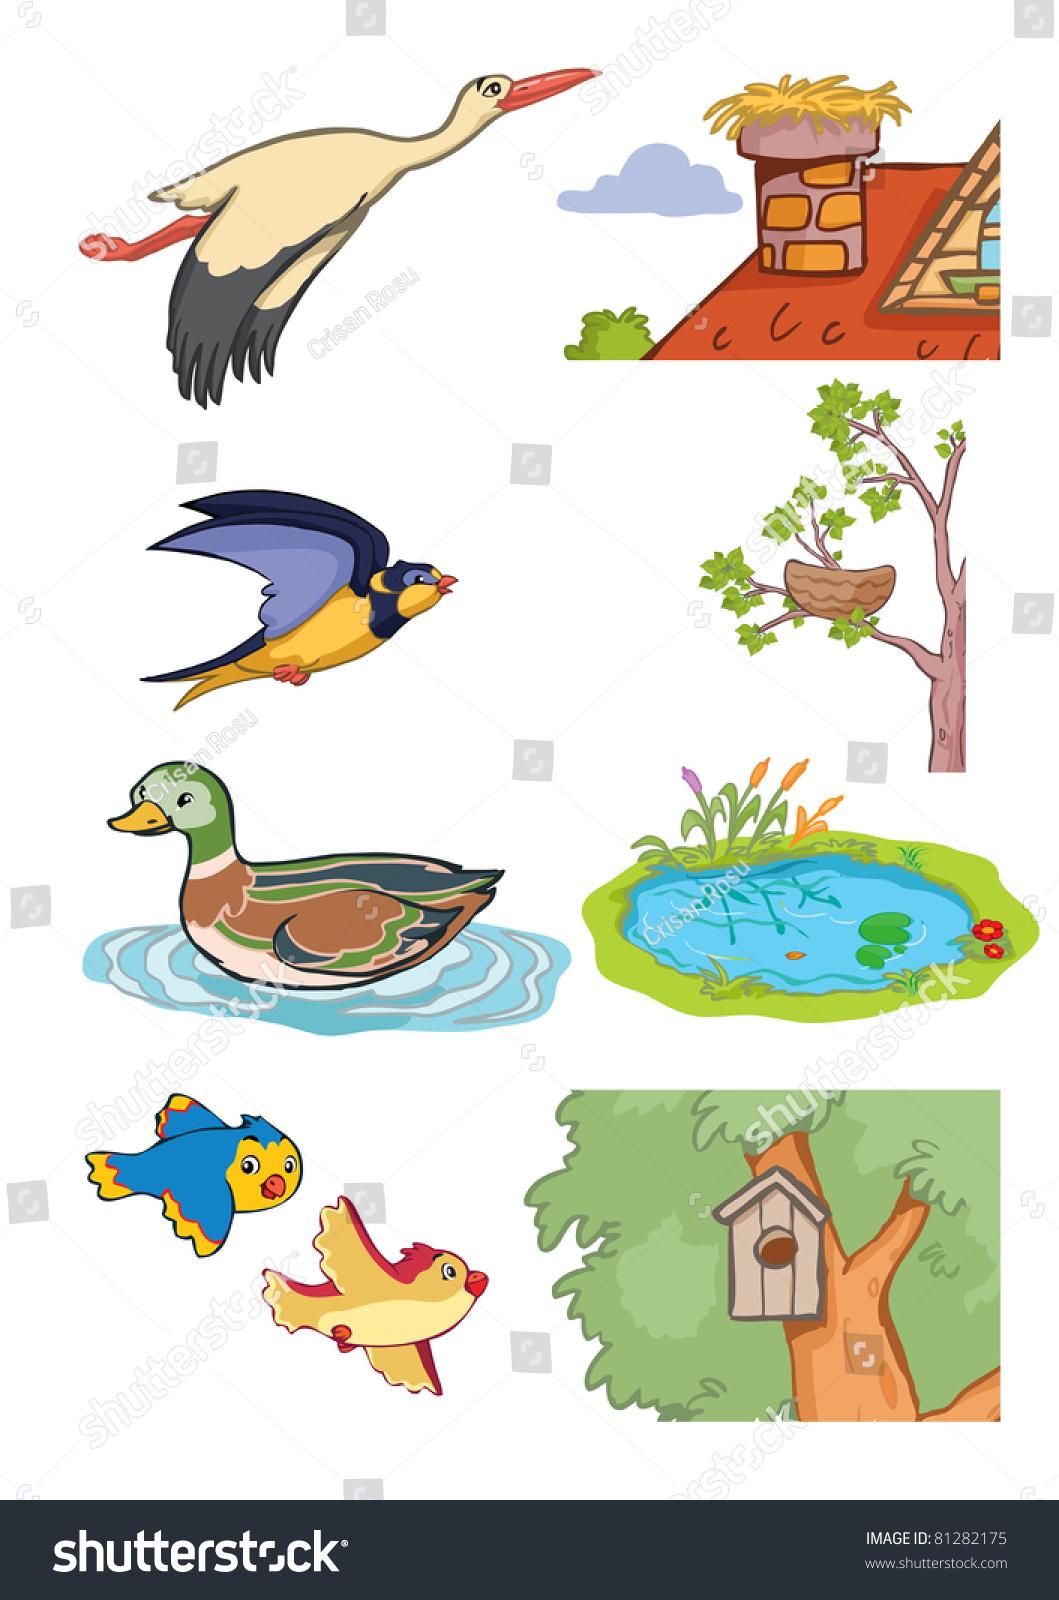 Stock Vector Vector Illustration Animals Habitat Cartoon Concept White Background on Kindergarten Animals Worksheets Water